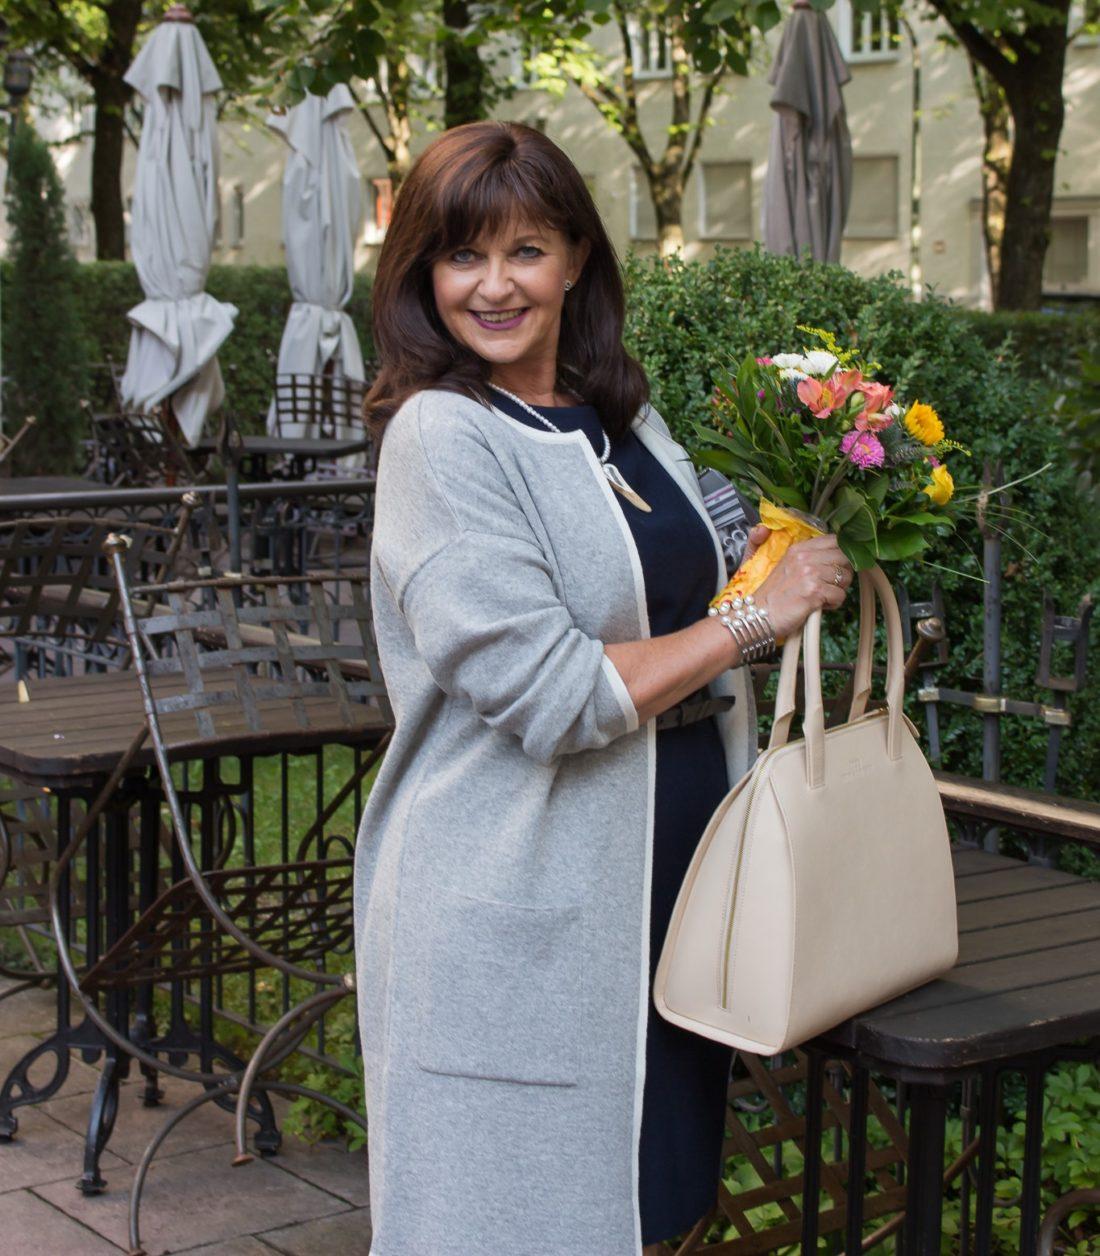 Martina Berg - Lady 50plus - Fashion & Lifestyle Blog für